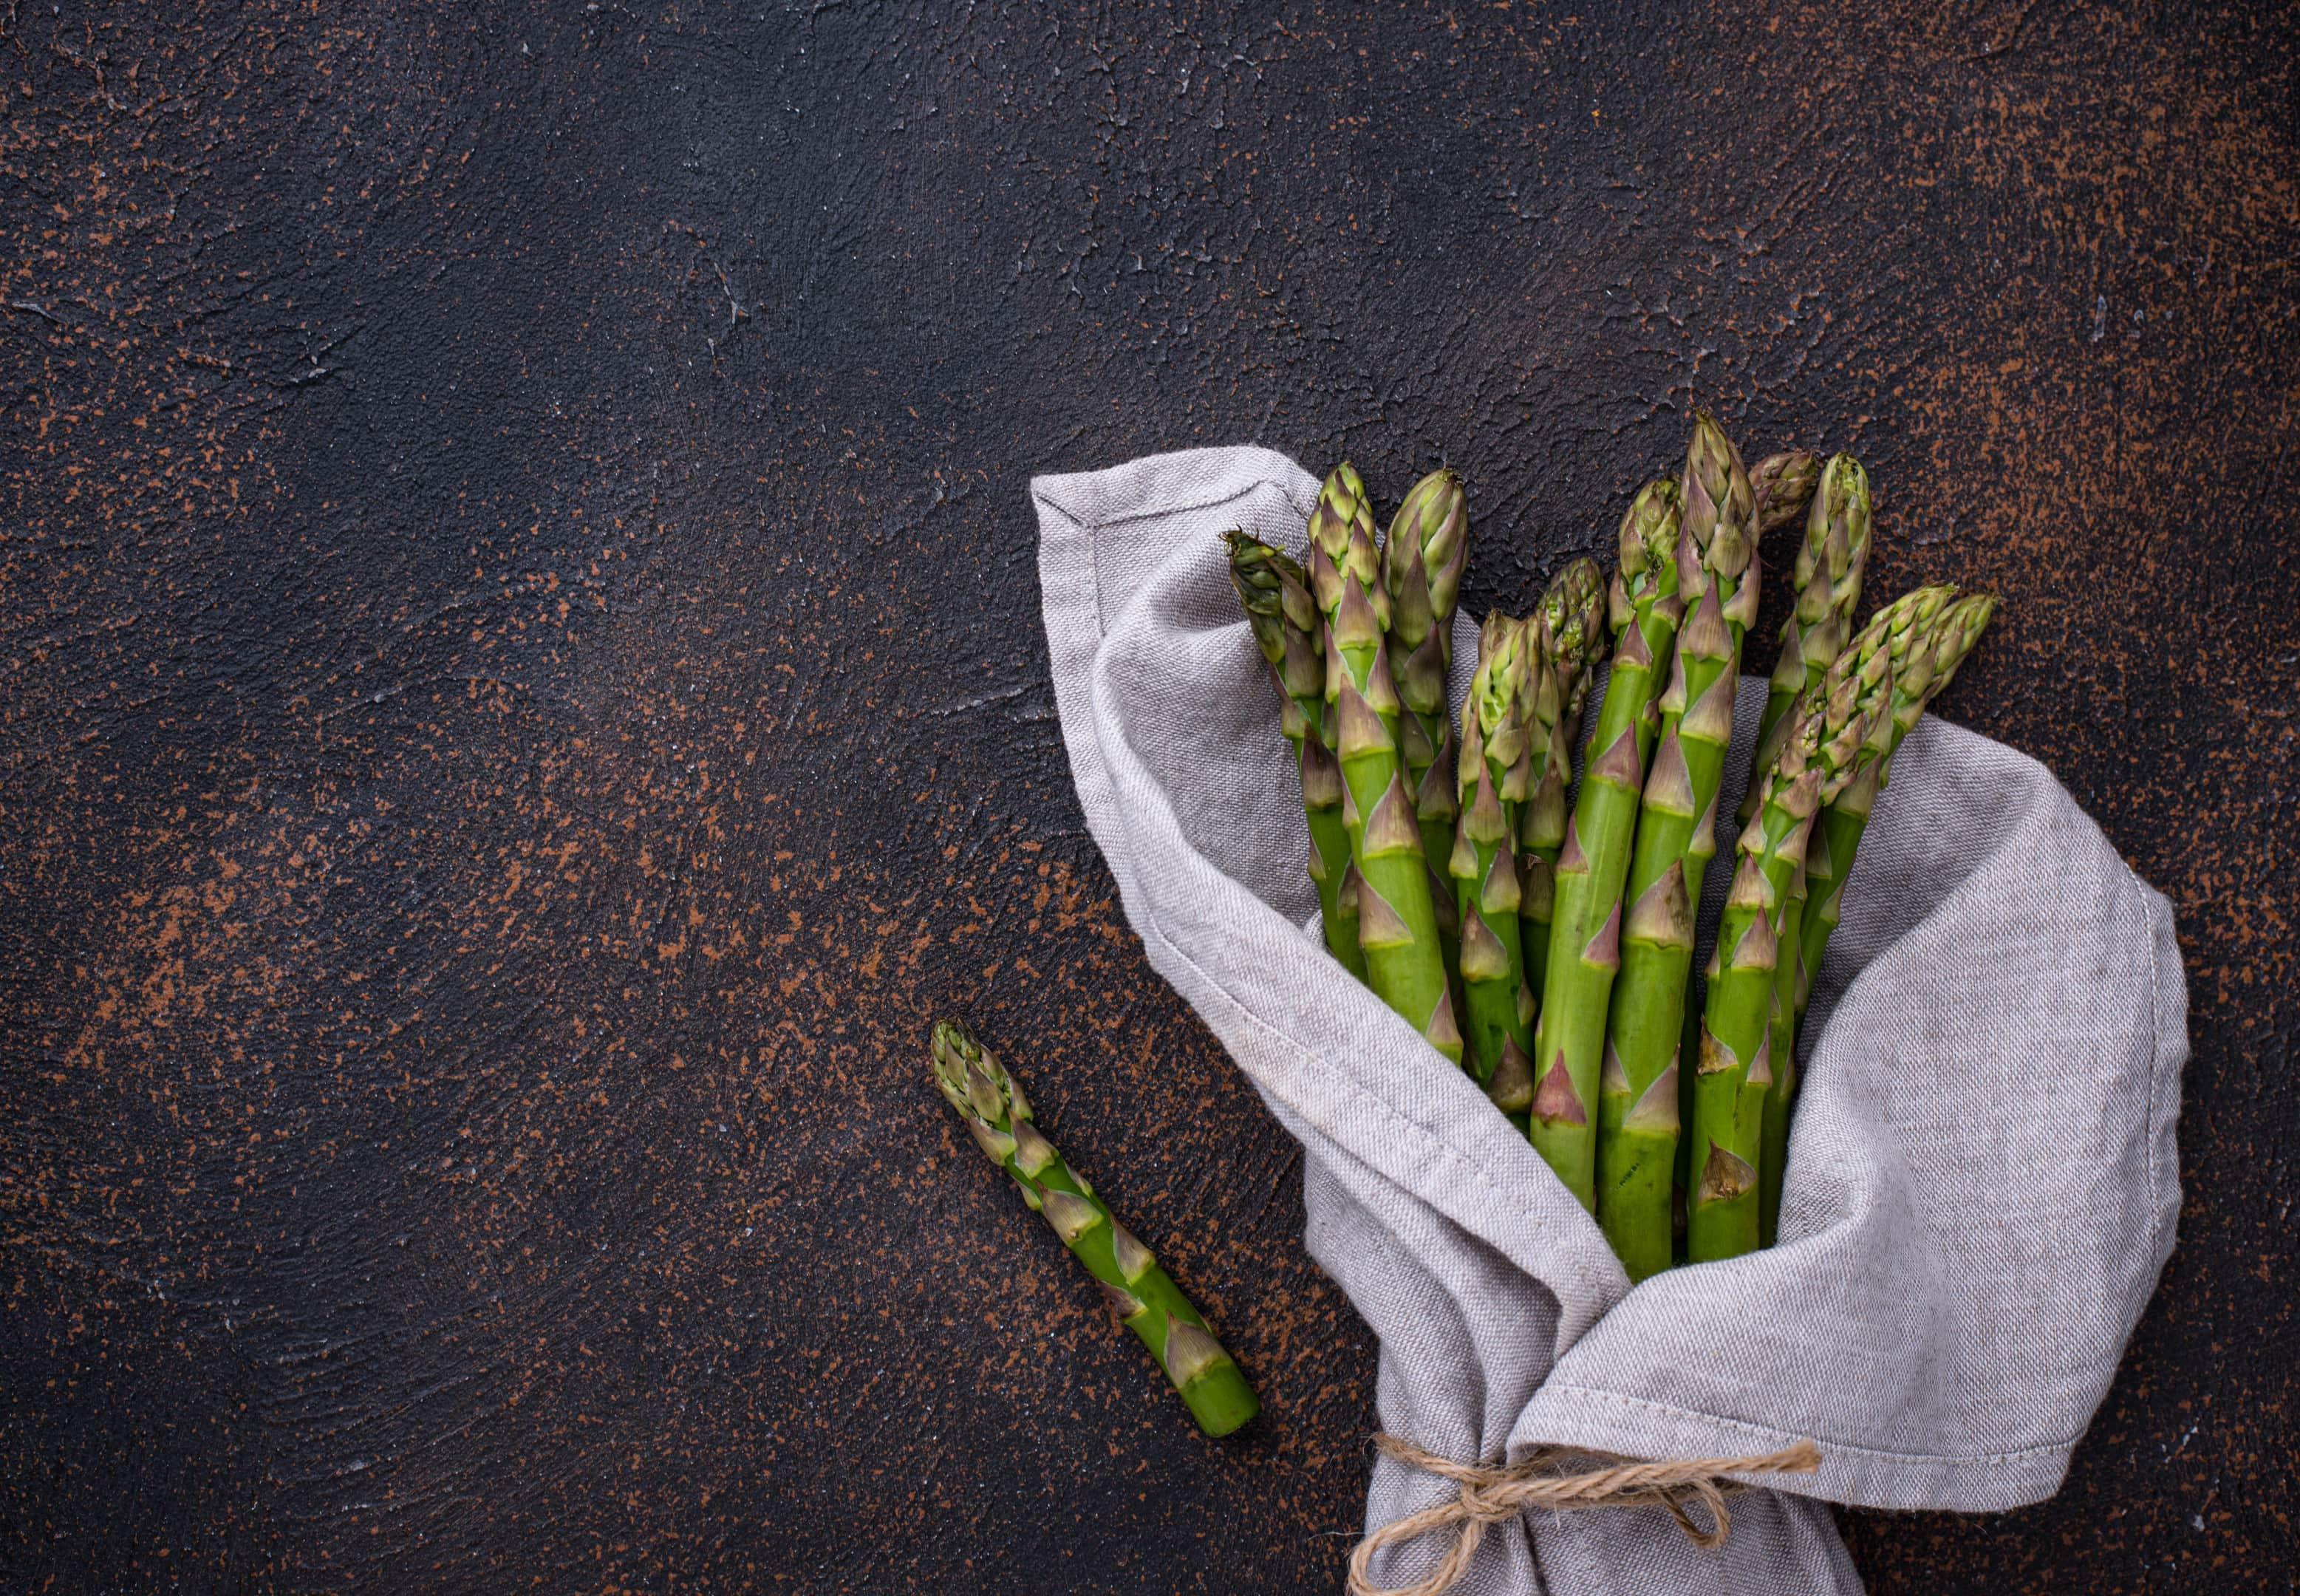 Fresh raw ripe green asparagus